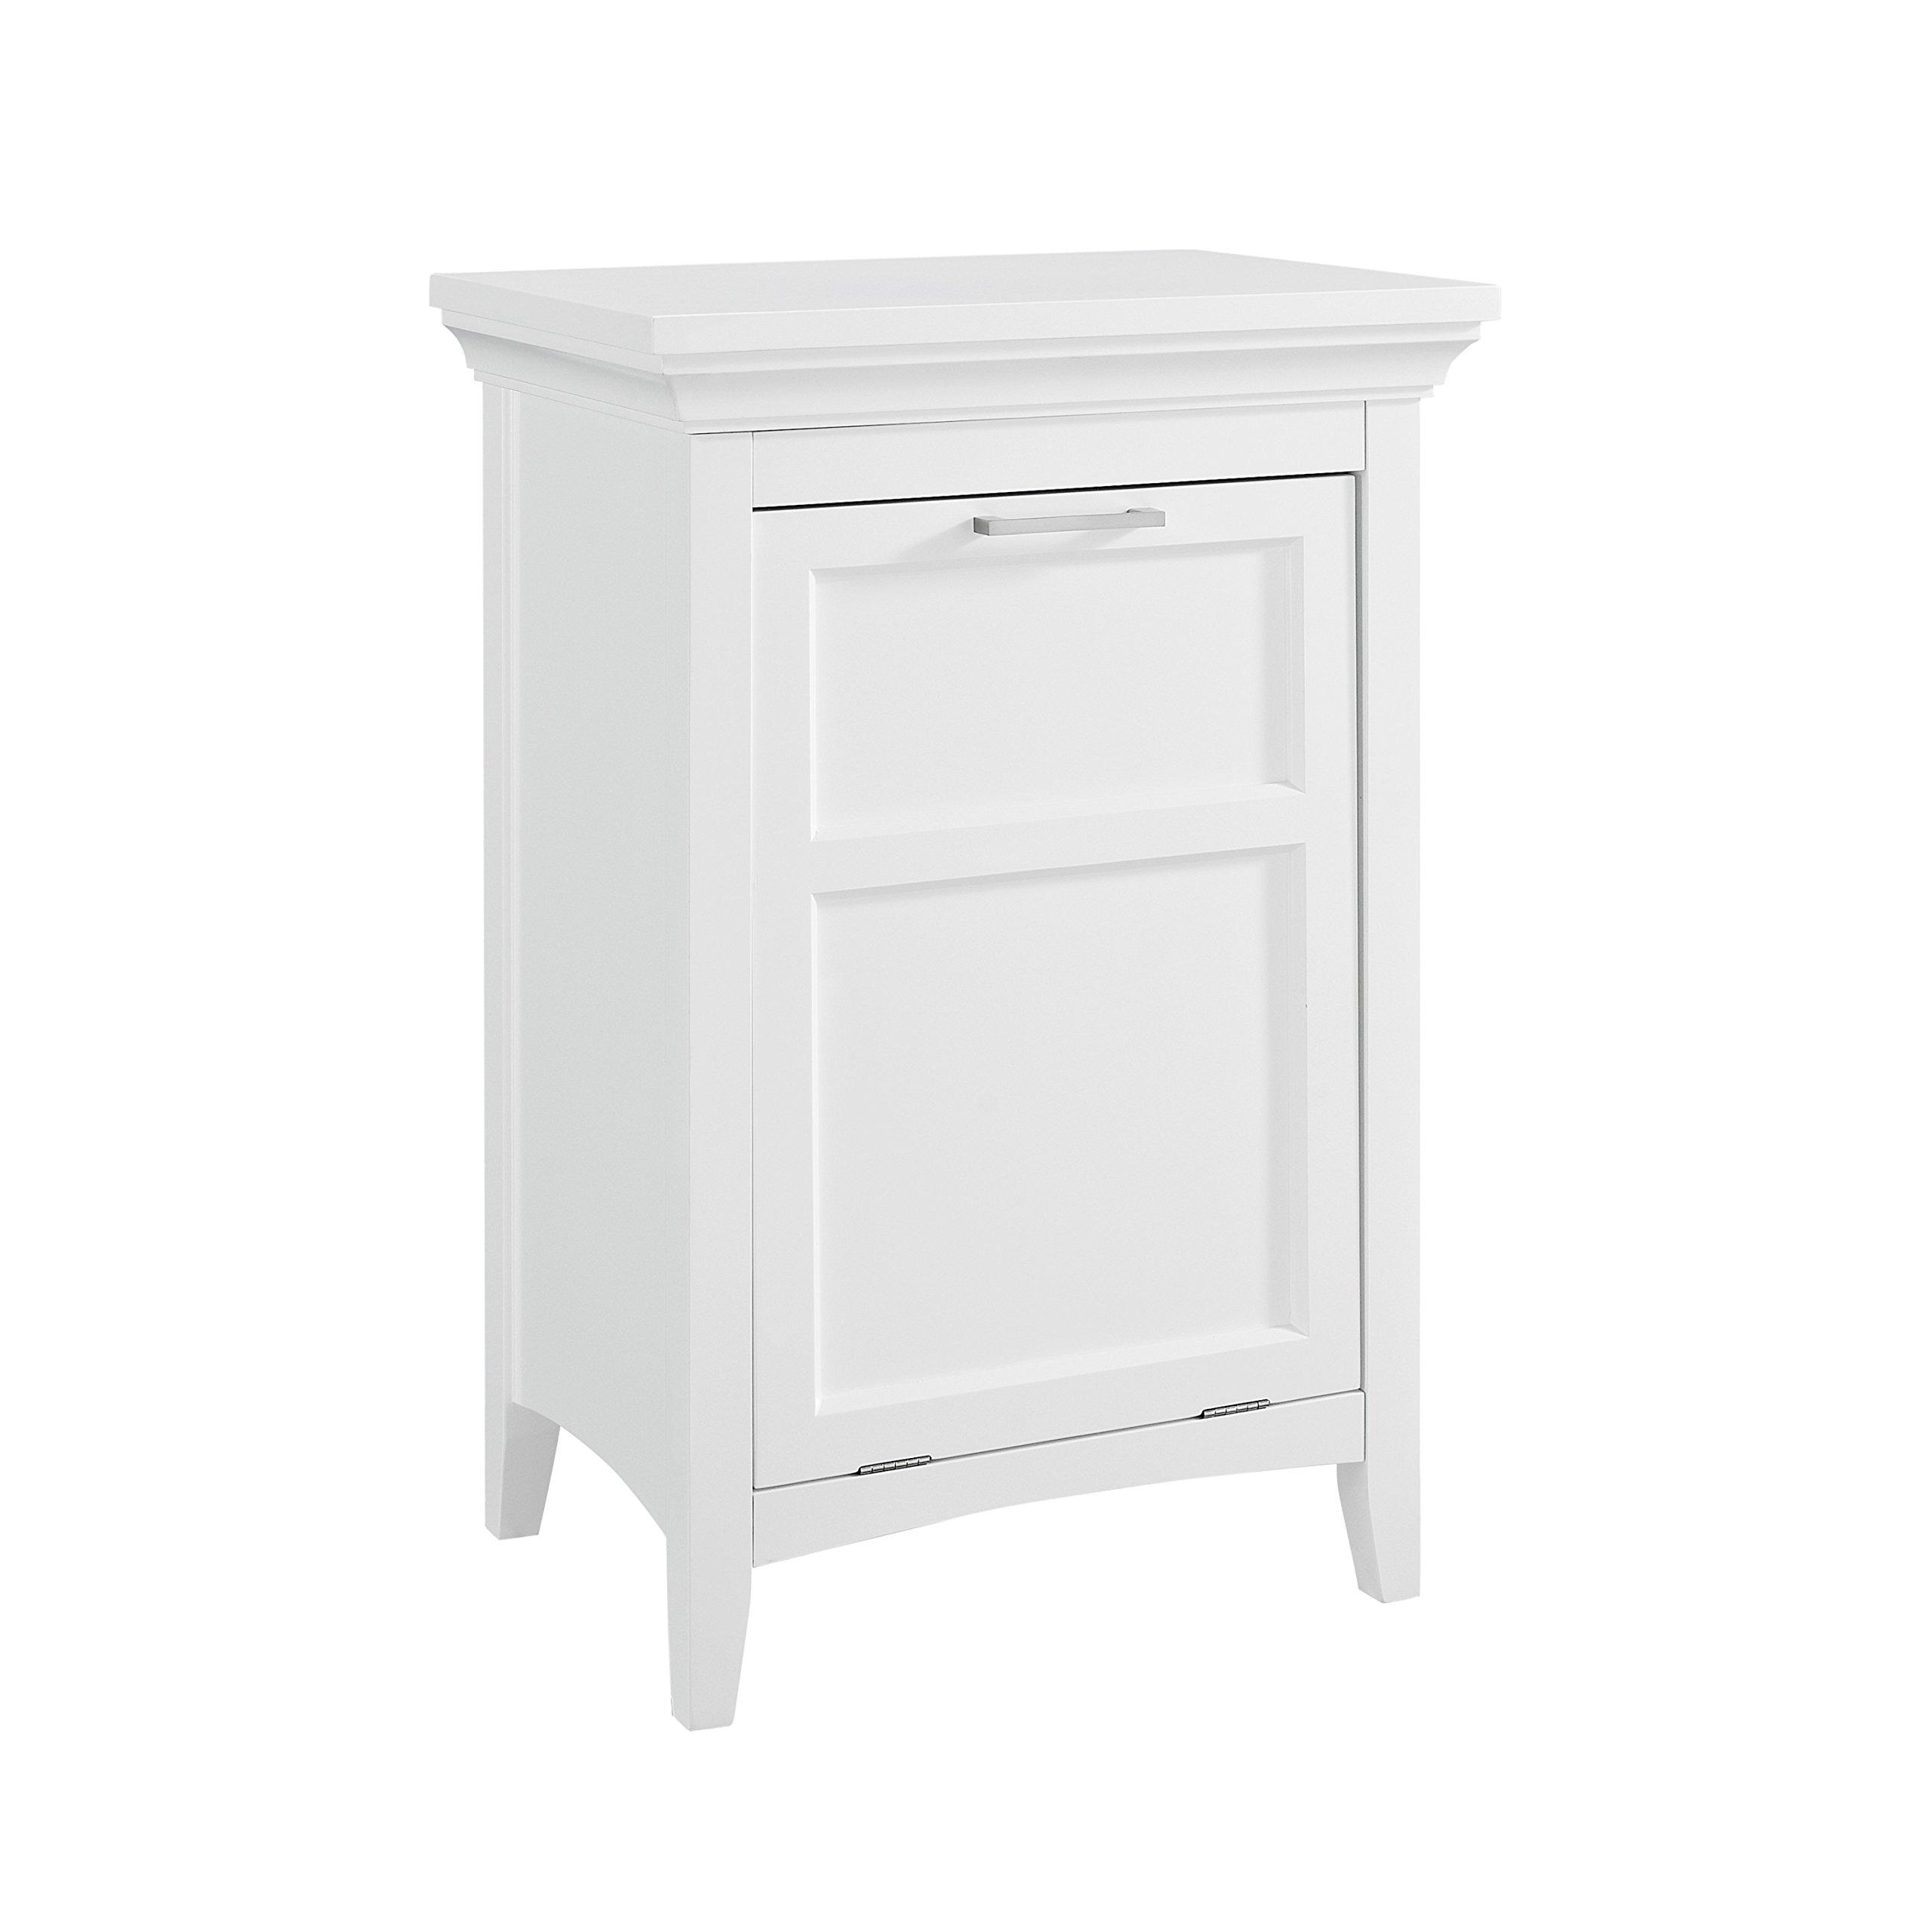 Simpli Home Avington Laundry Hamper, White